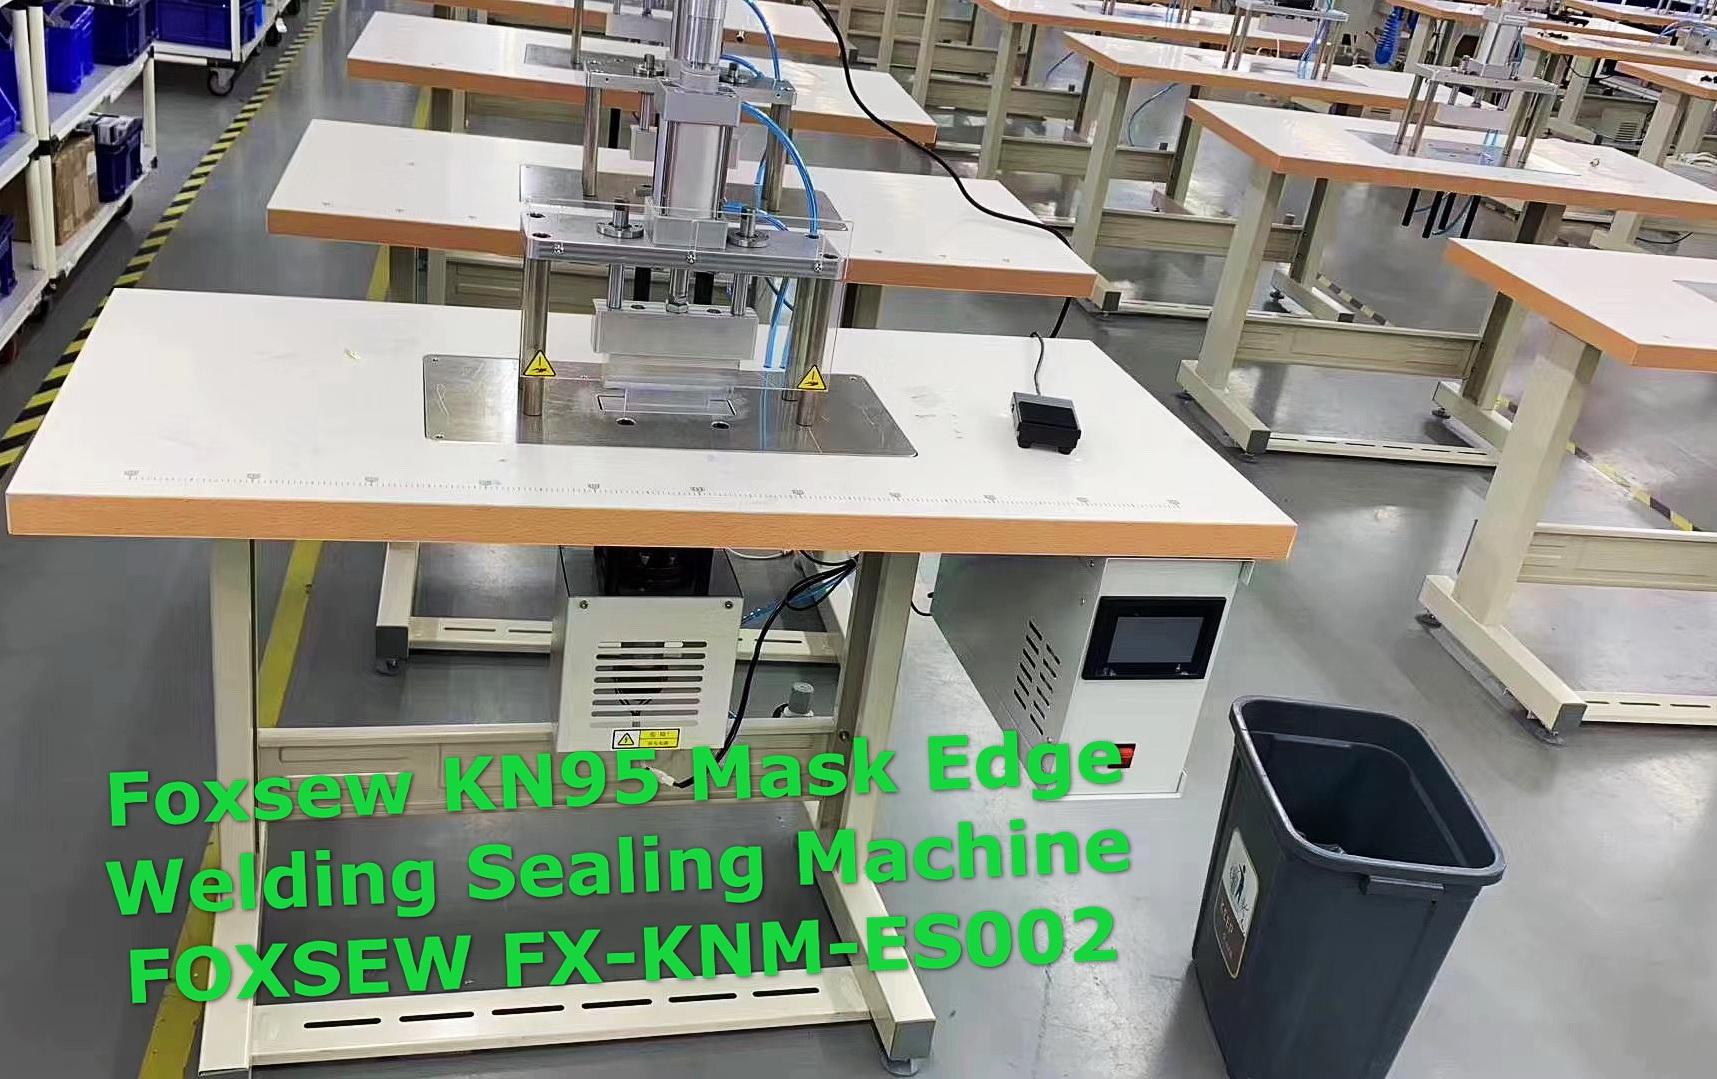 Ultrasonic KN95 Mask Edge Welding Sealing Machine FOXSEW FX-KNM-ES002 (3)